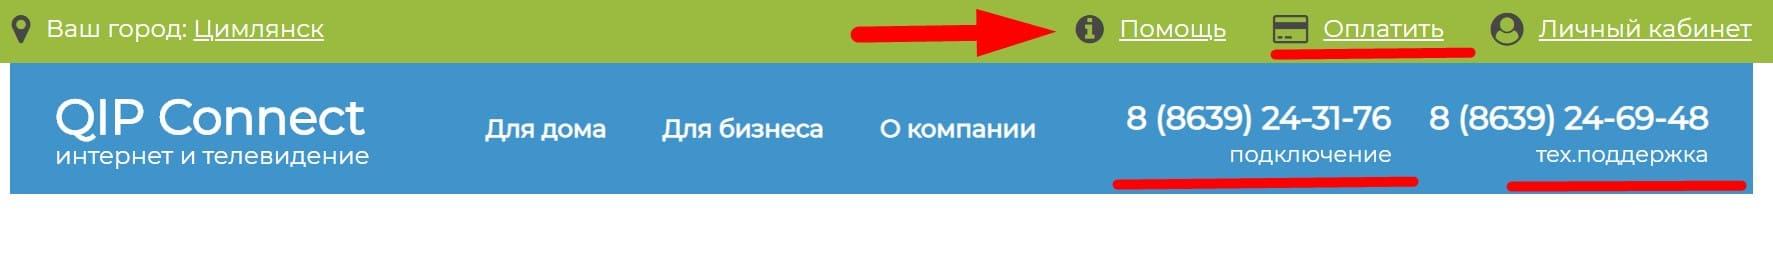 Qipconnect интернет провайдер